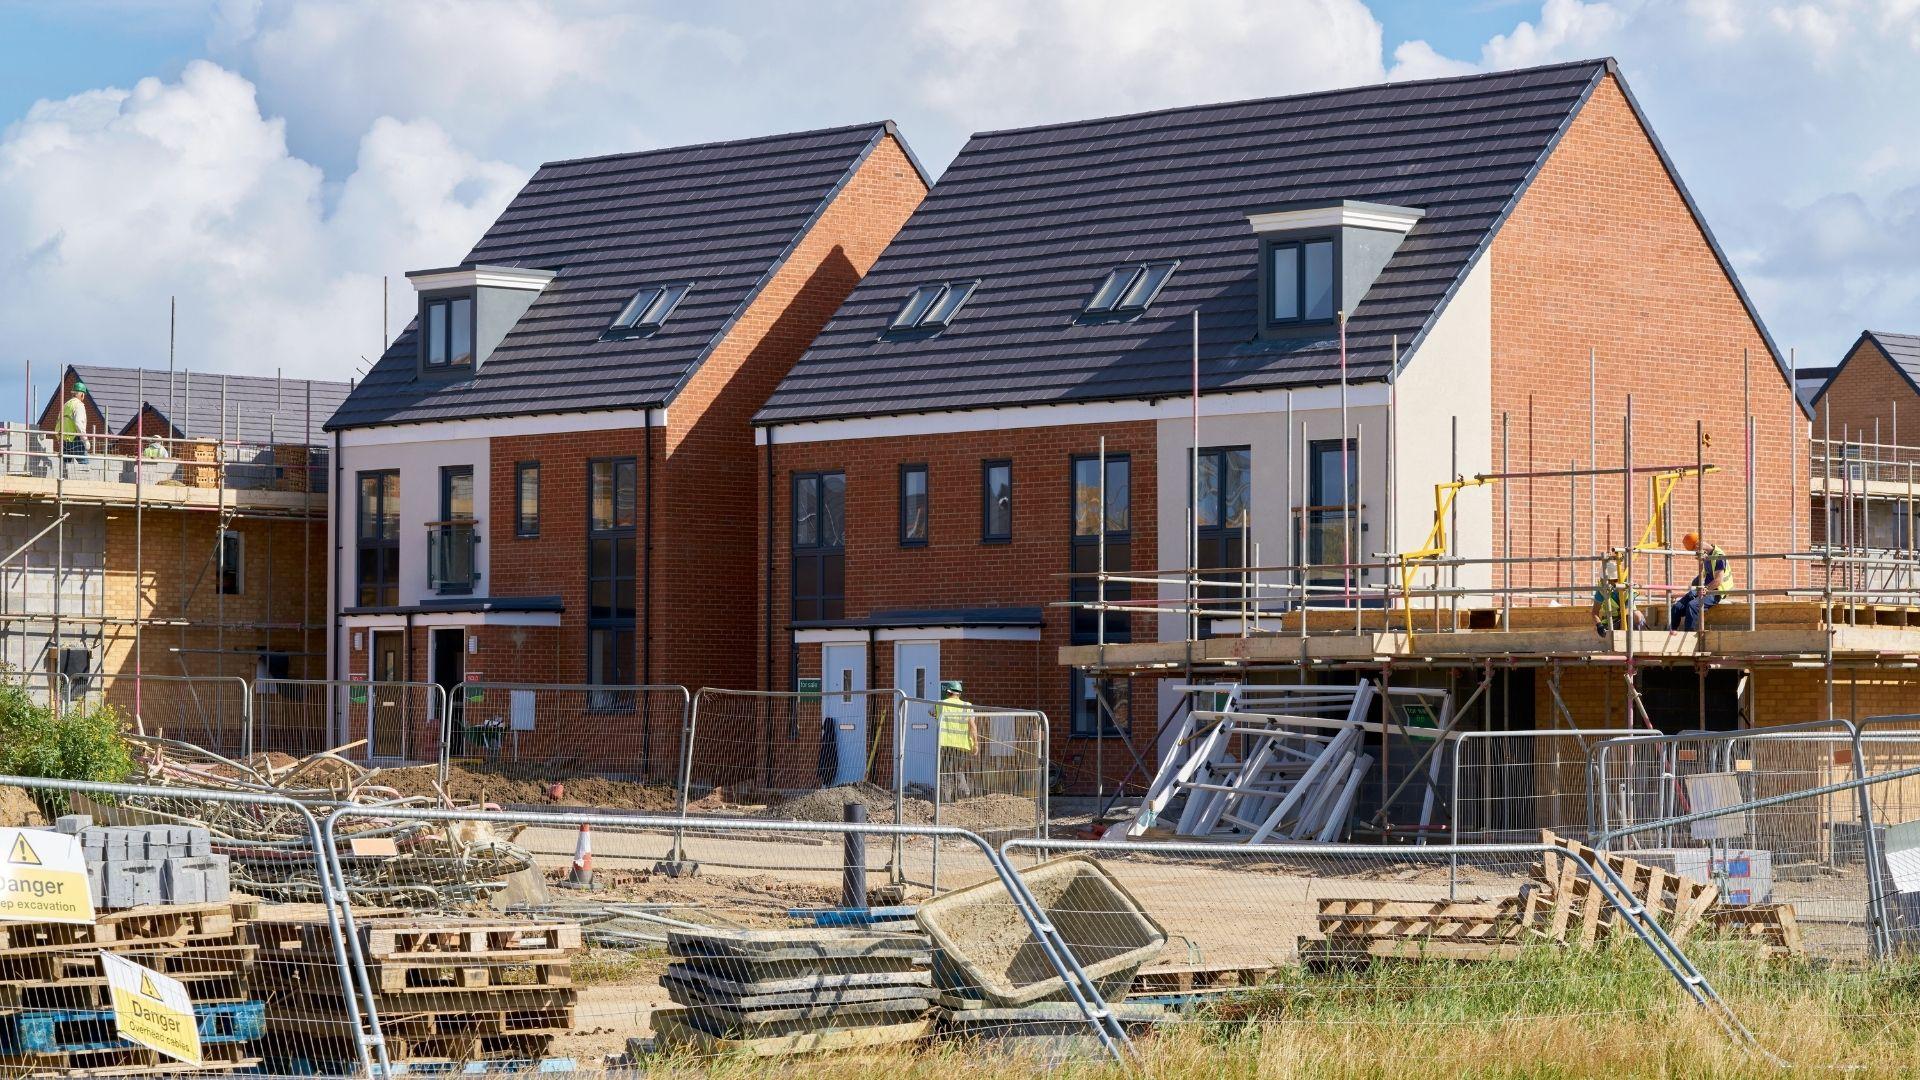 New rural housing construction